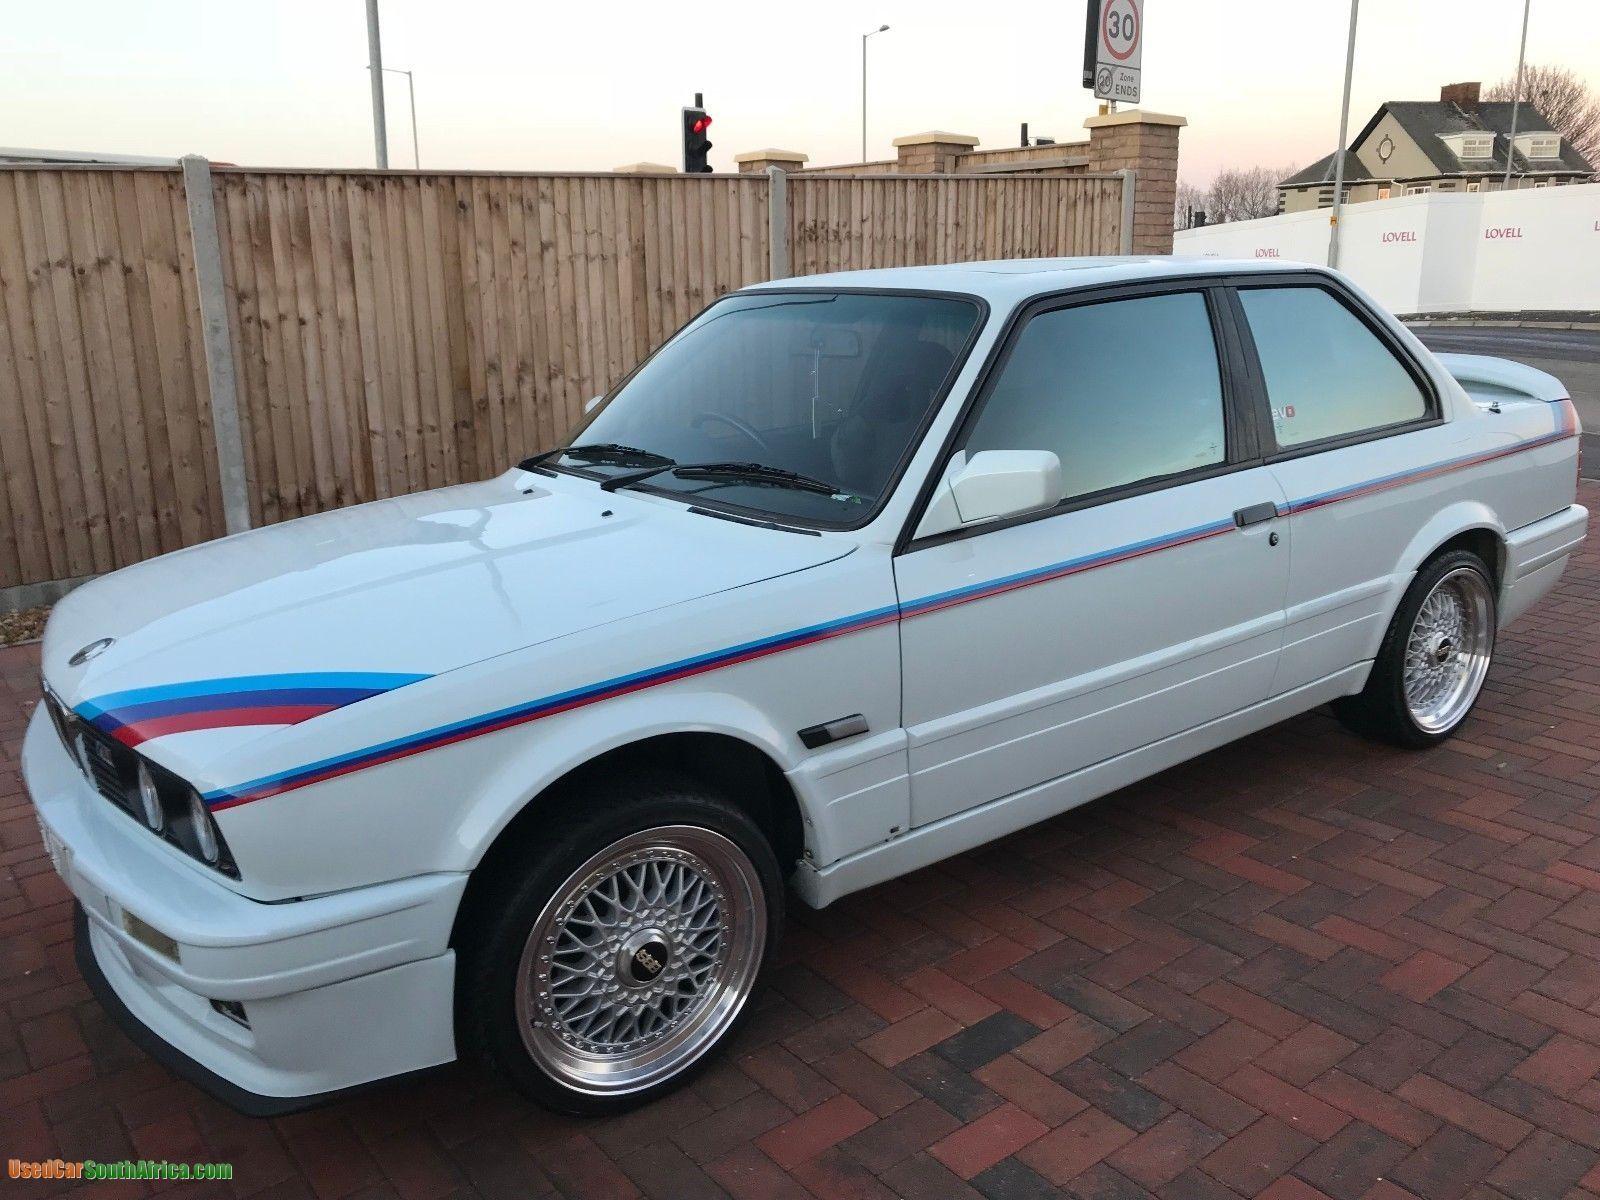 1989 Bmw 325is Sport Used Car For Sale In Bronkhorstspruit Gauteng